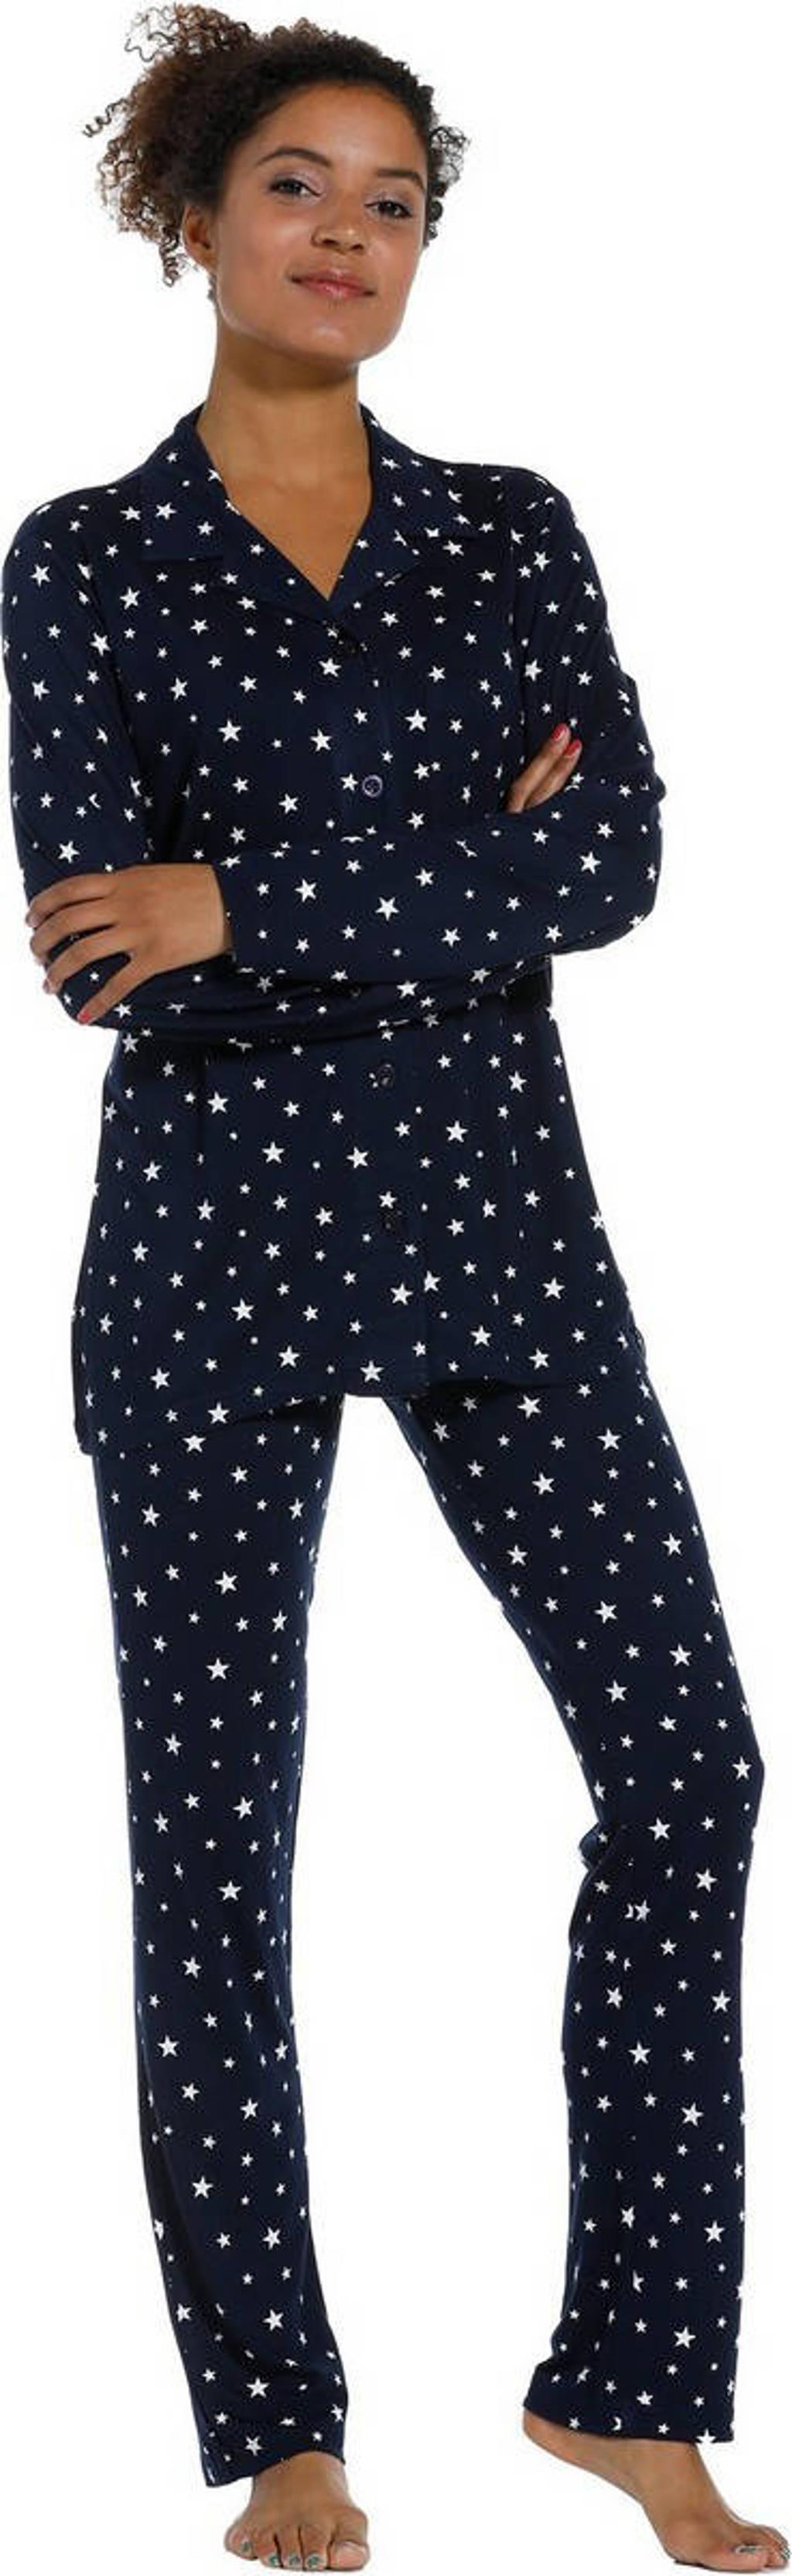 Rebelle pyjama met all over print donkerblauw, Donkerblauw